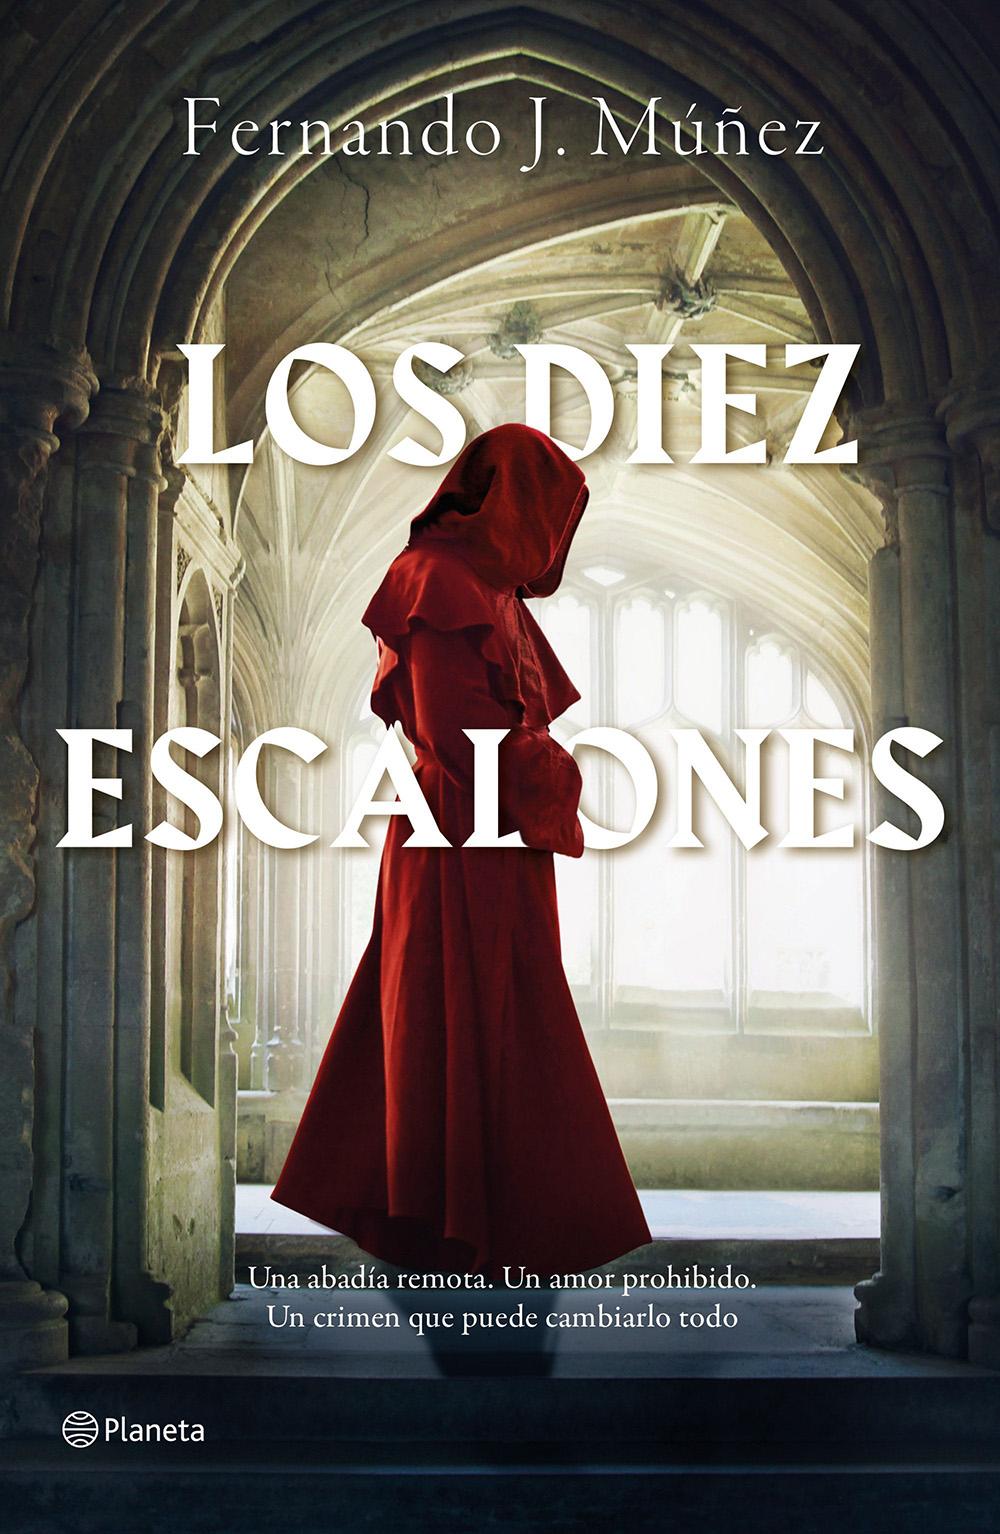 Los Diez Escalones (Fernando J. Múñez, 2021)